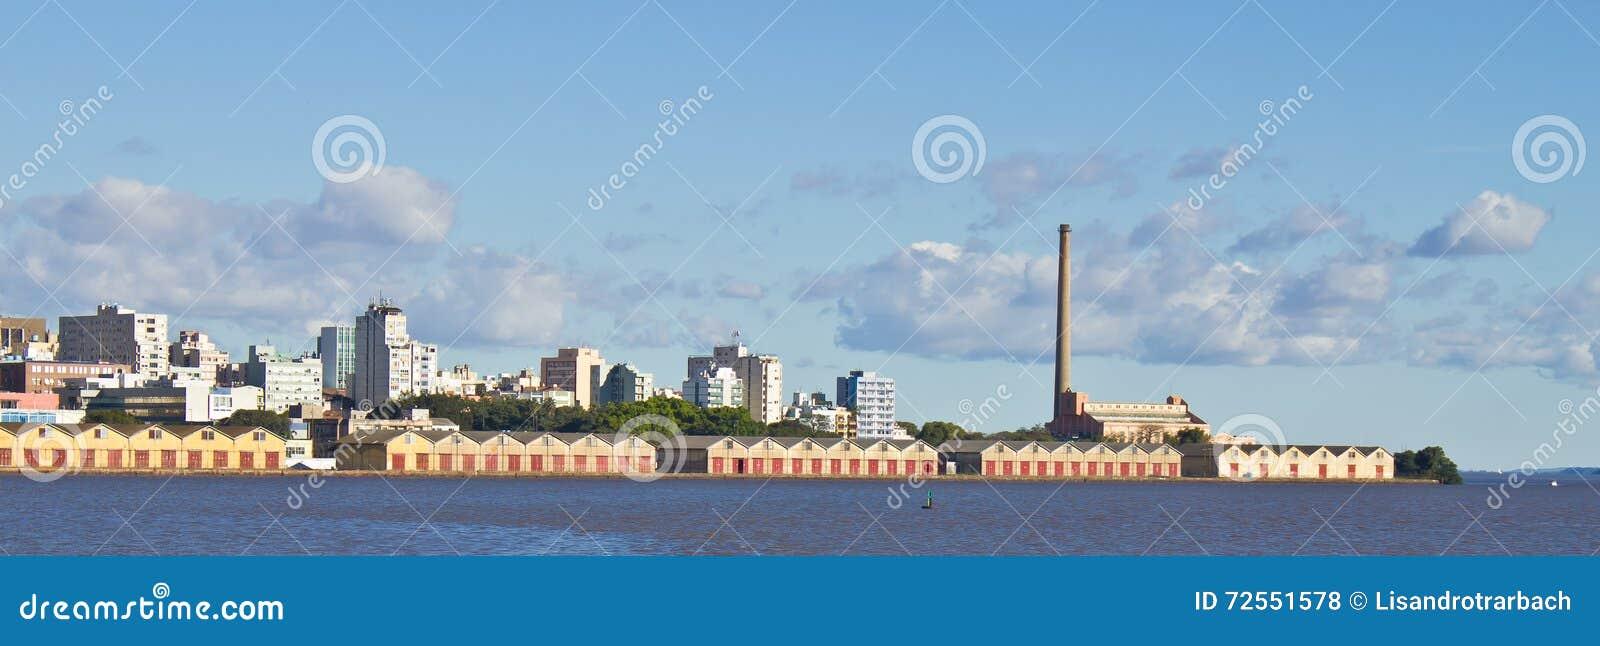 Port de Porto Alegre